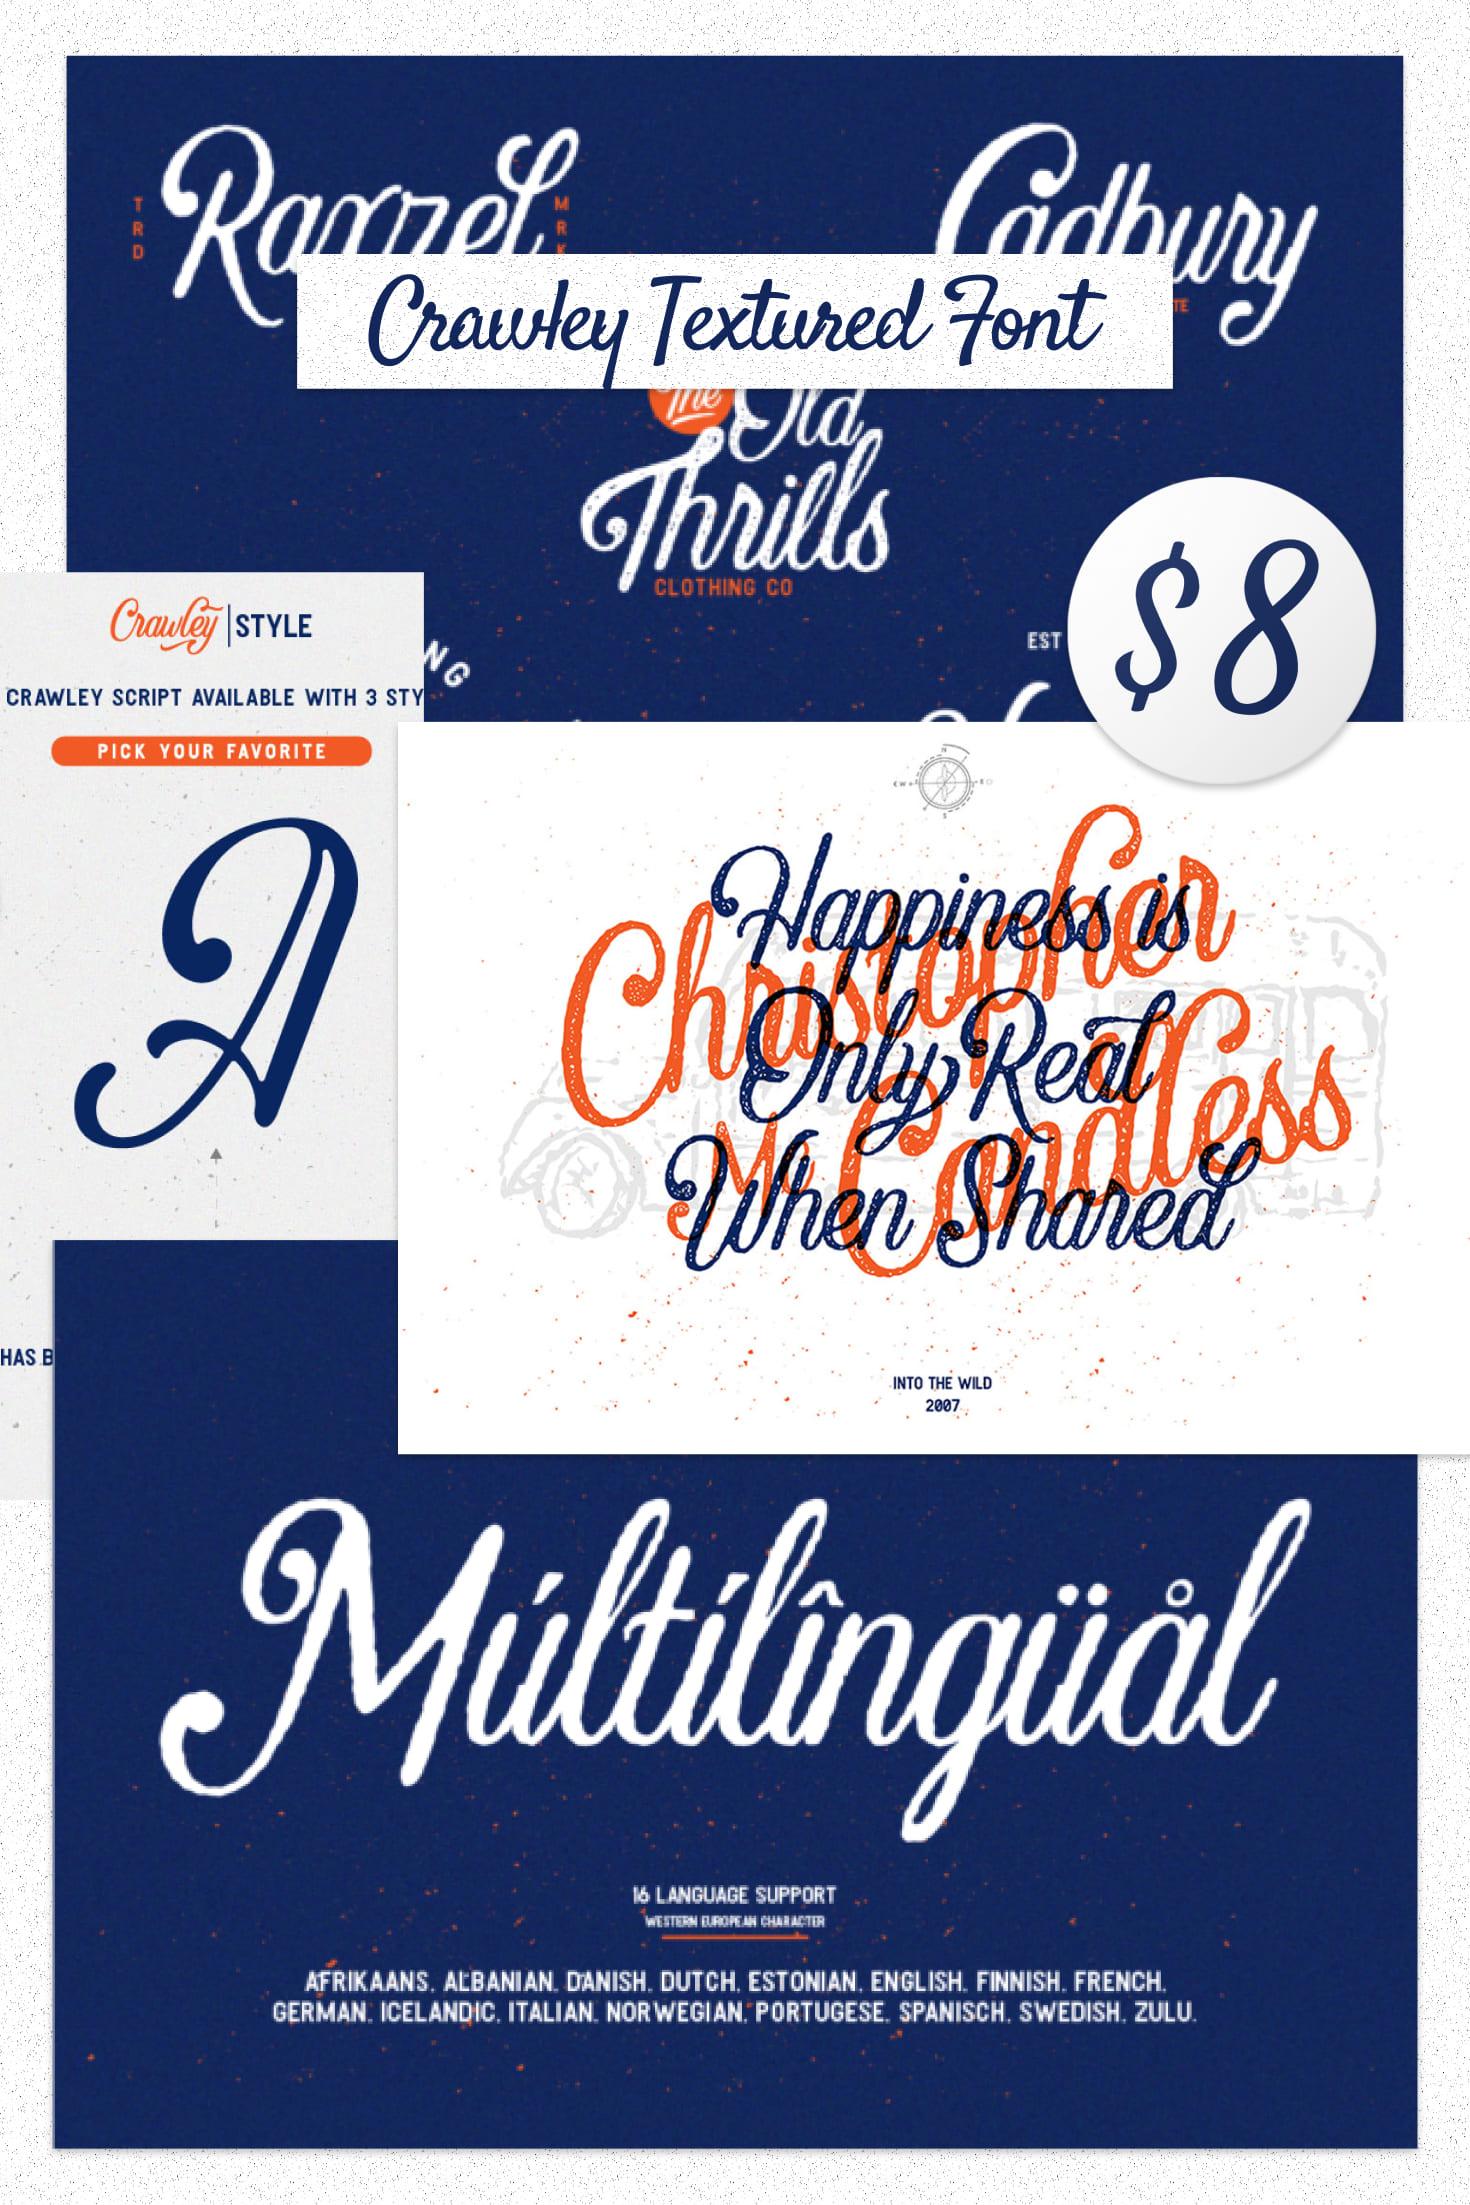 Pinterest Image: Crawley Textured Font Duo + Illustration.